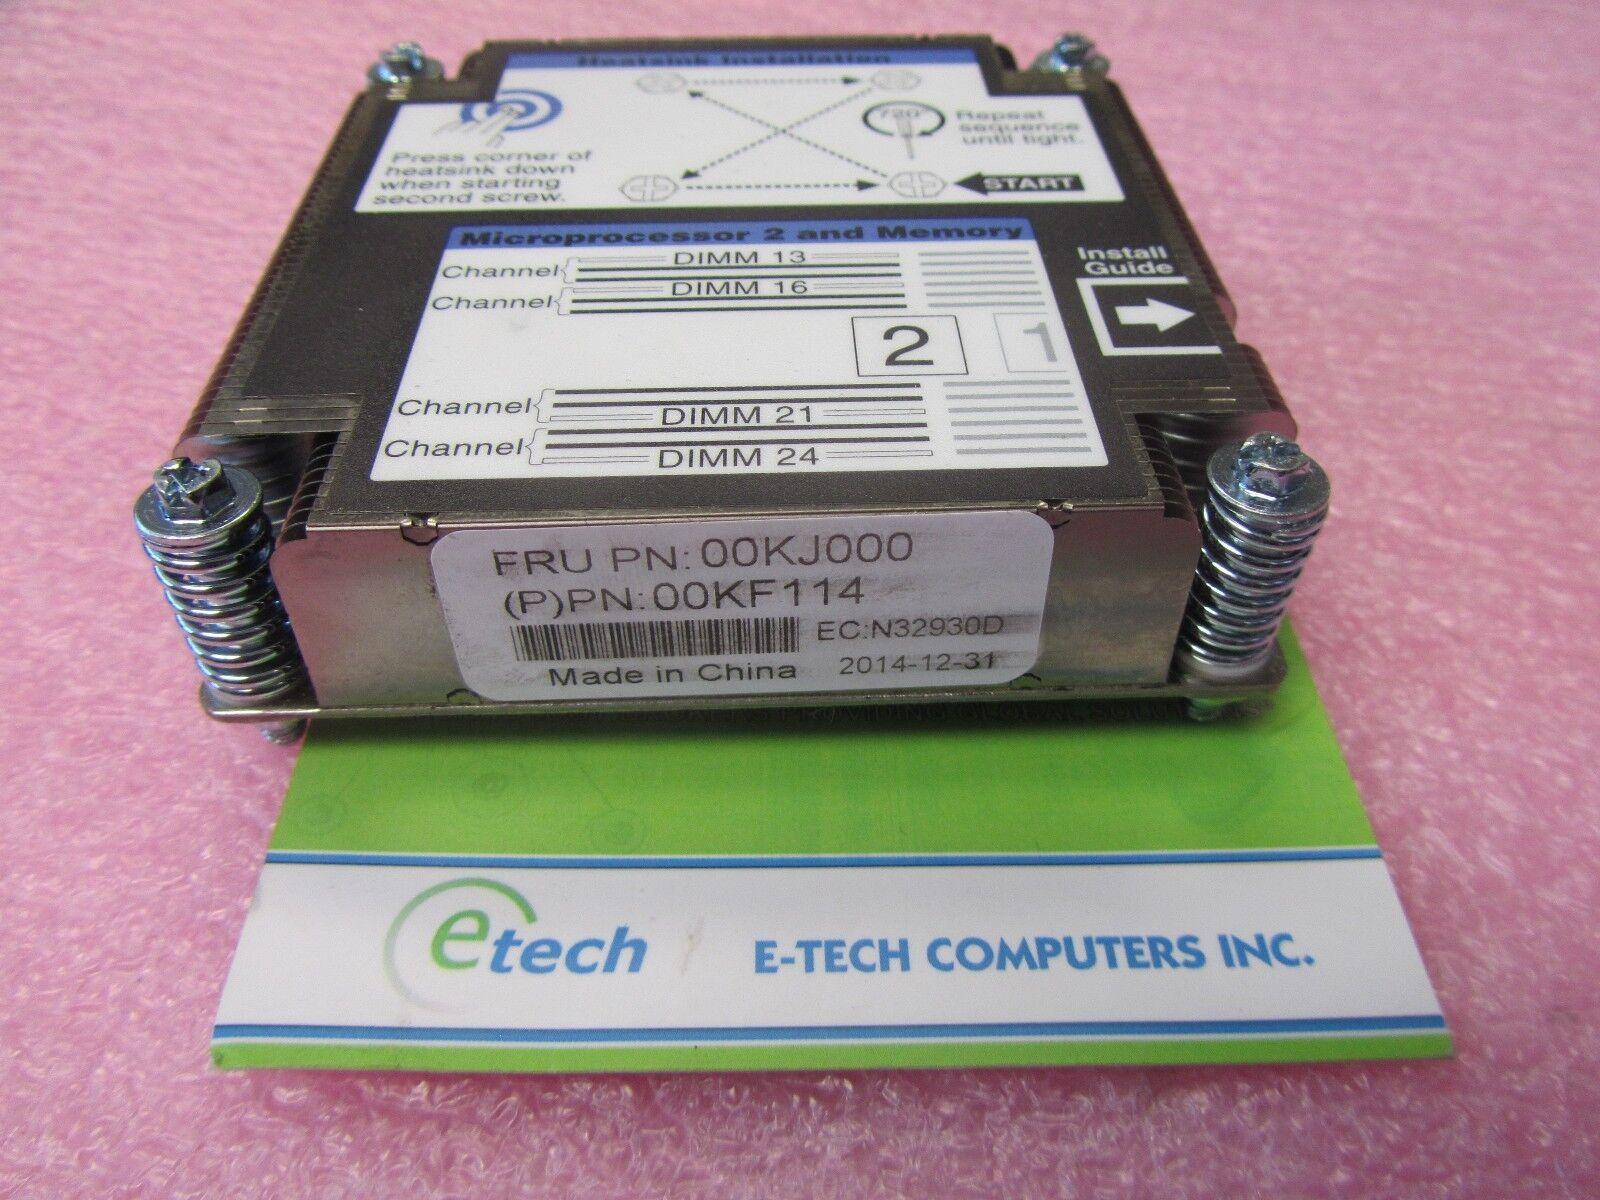 00KJ000 - IBM Lenovo Flex System x240 M5 CPU 2 Heatsink, 135W TDP